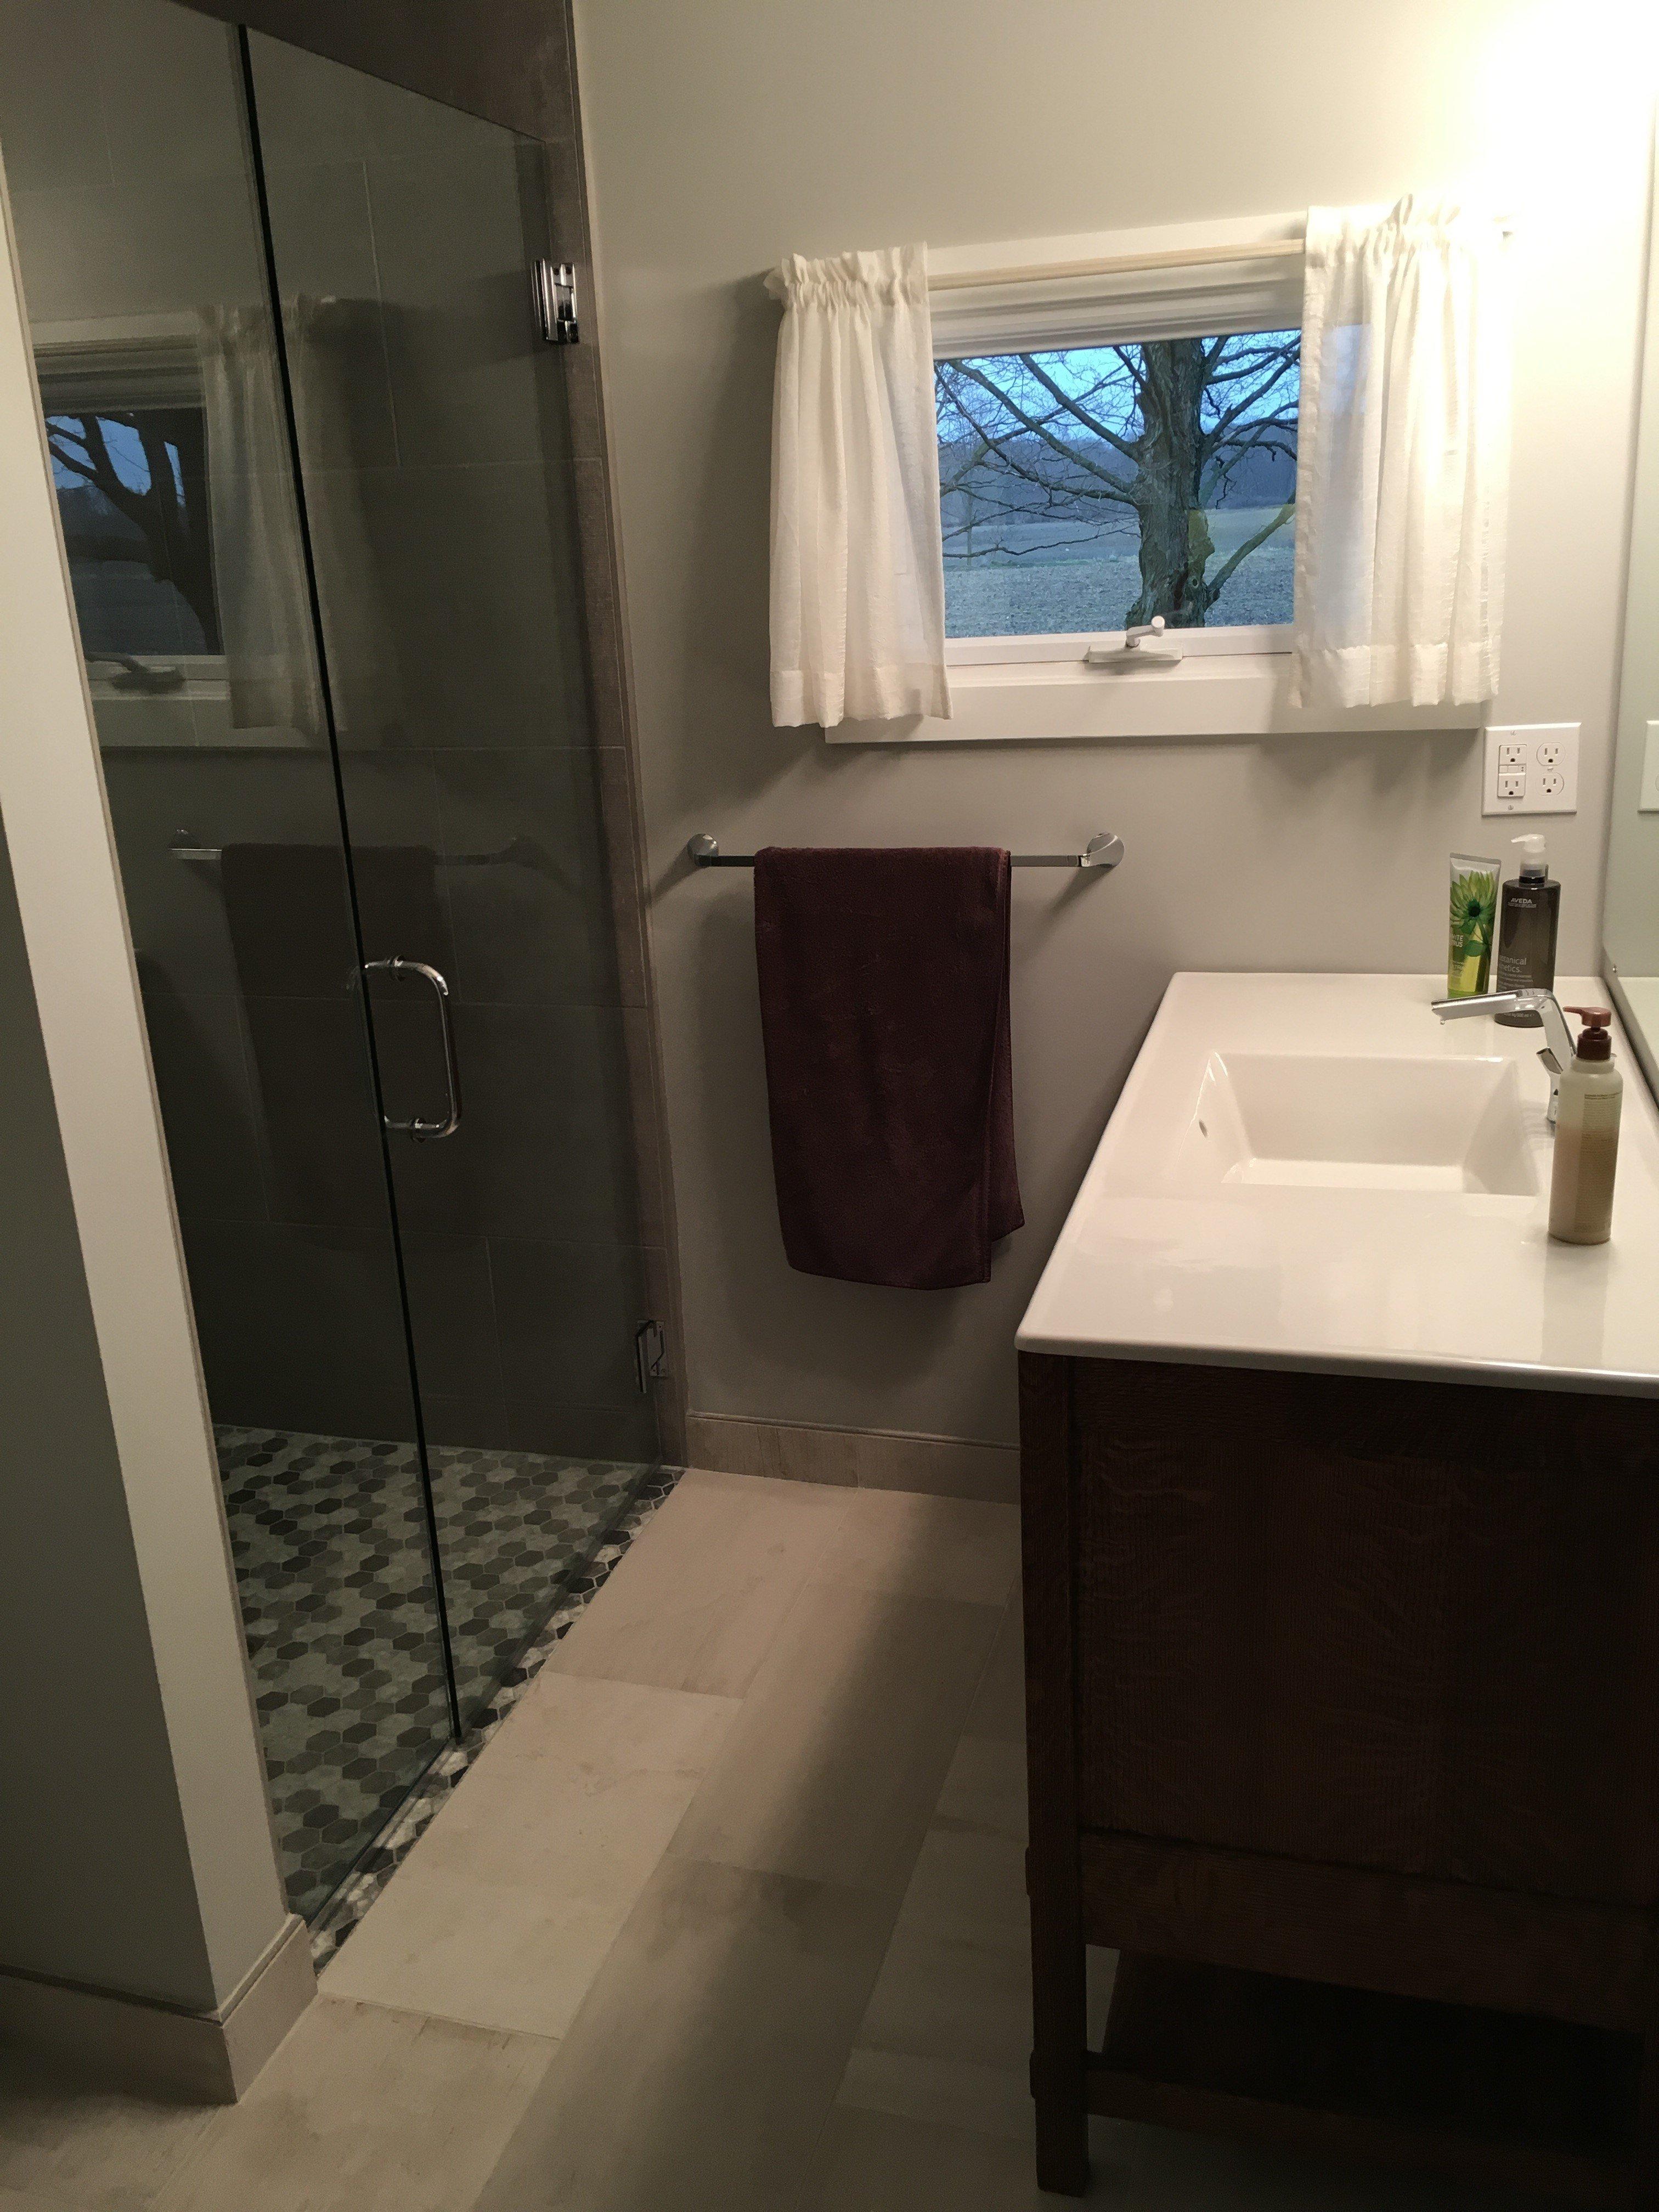 Heated curbless shower in bathroom